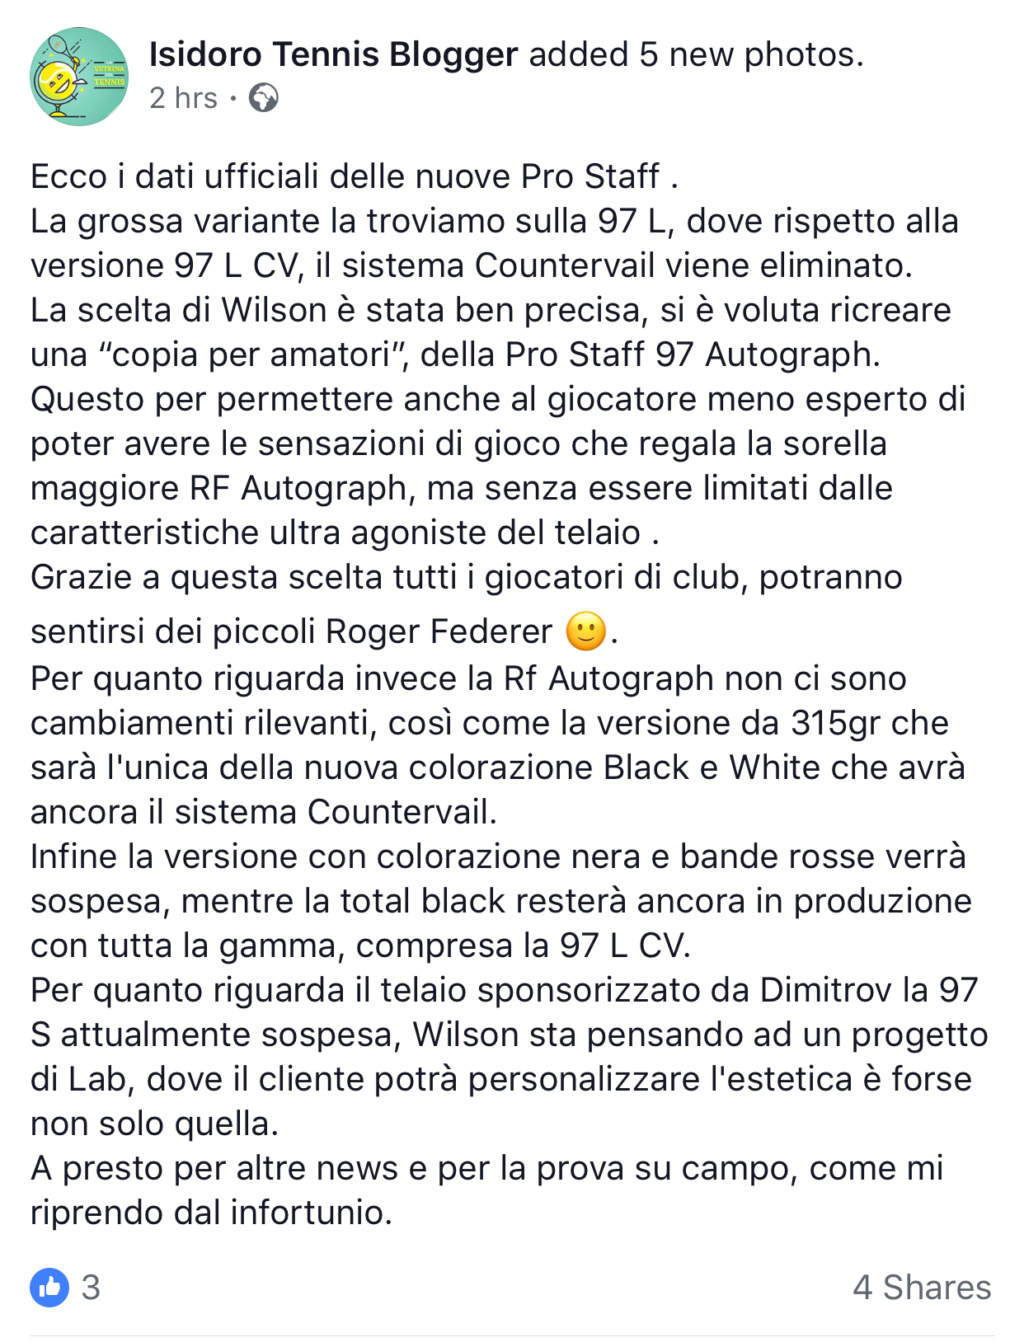 Nuova pro staf bianco/nera di Roger 72bbbb10